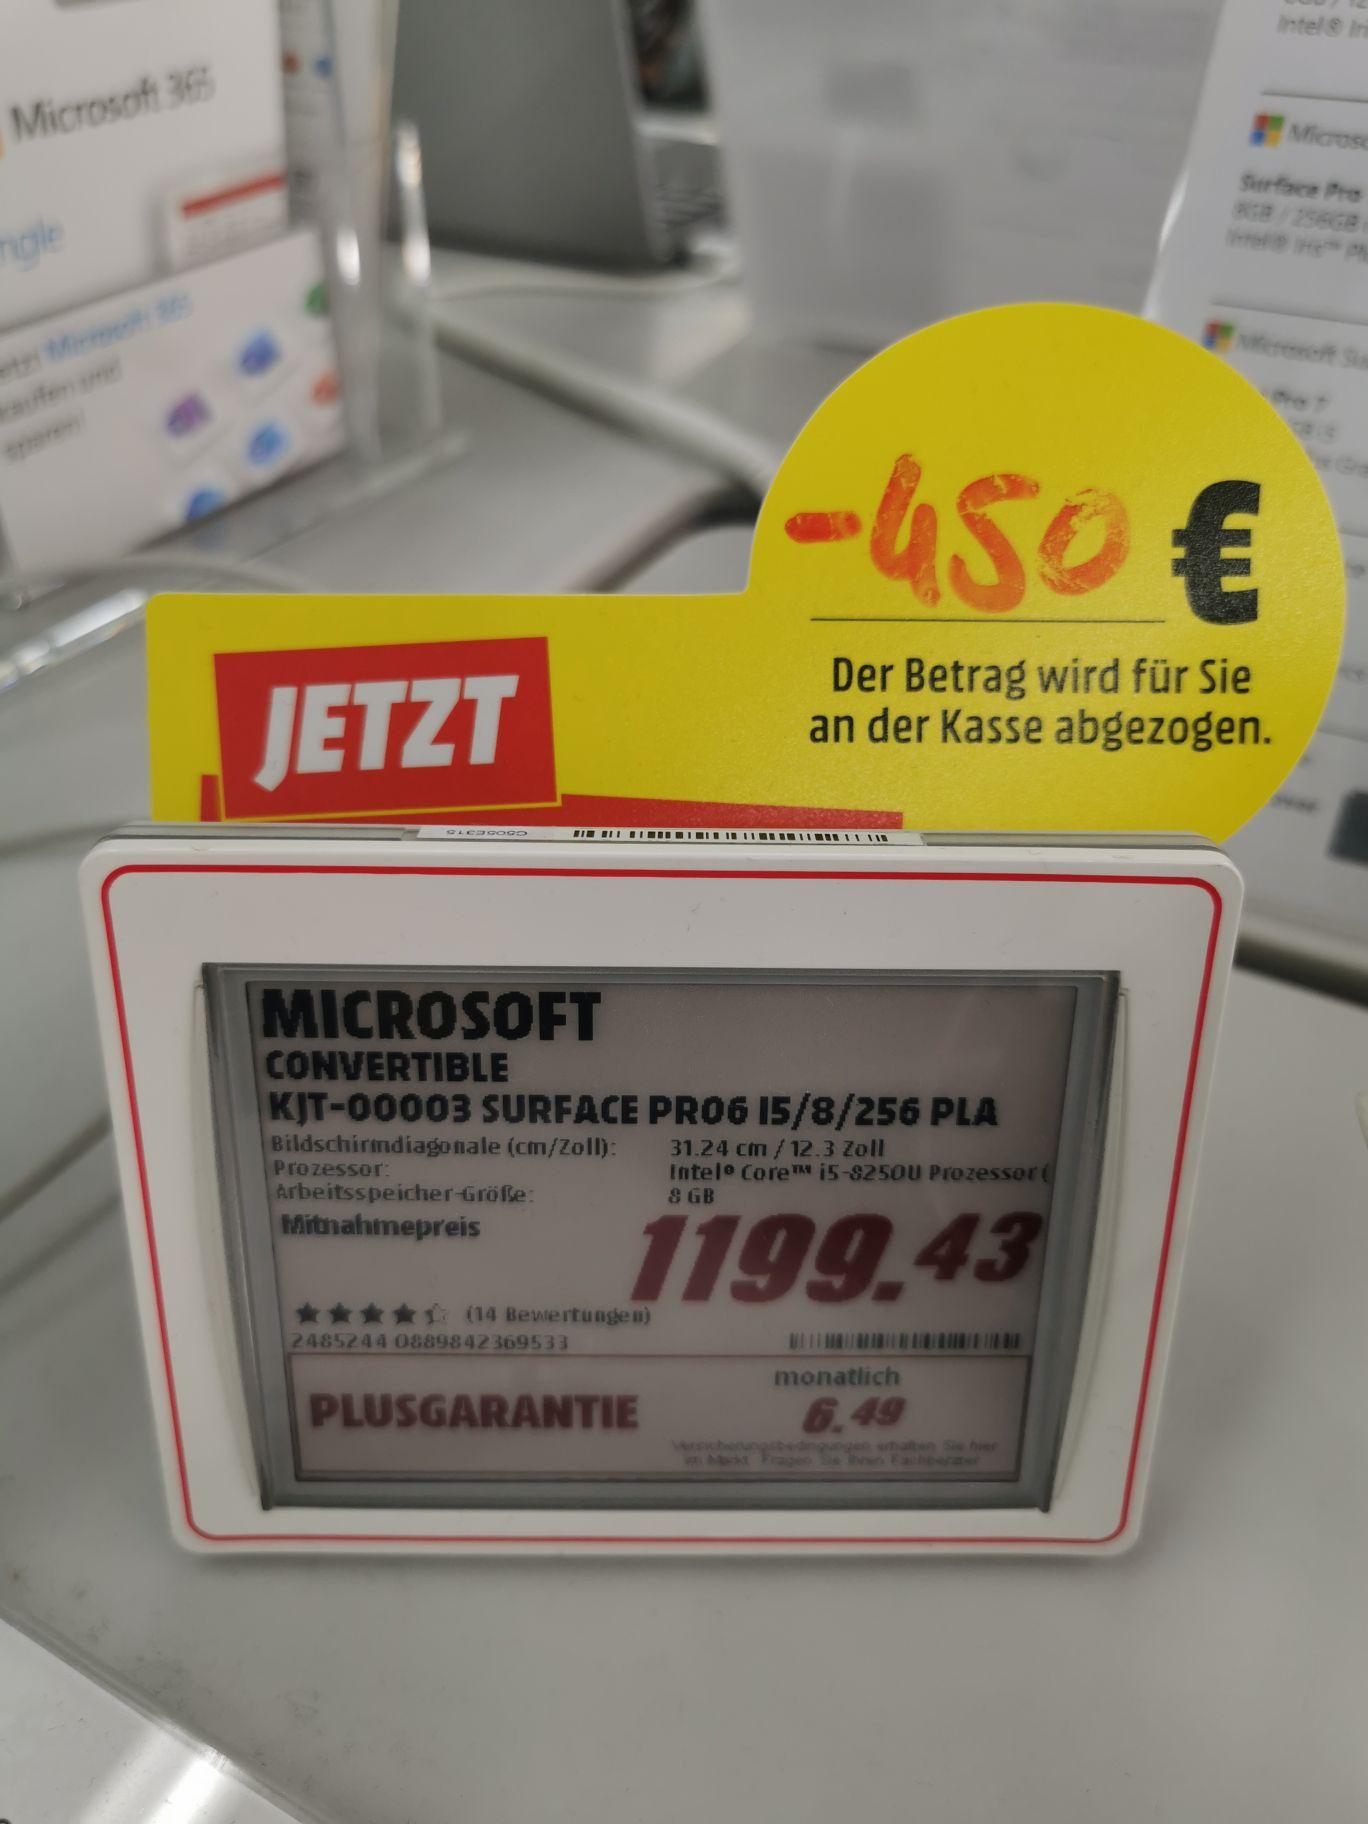 Lokal MM Friedrichshafen Microsoft Surface Pro 6, 31,25 cm (12,3 Zoll) 2-in-1 Tablet (Intel Core i5, 8GB RAM, 256GB SSD